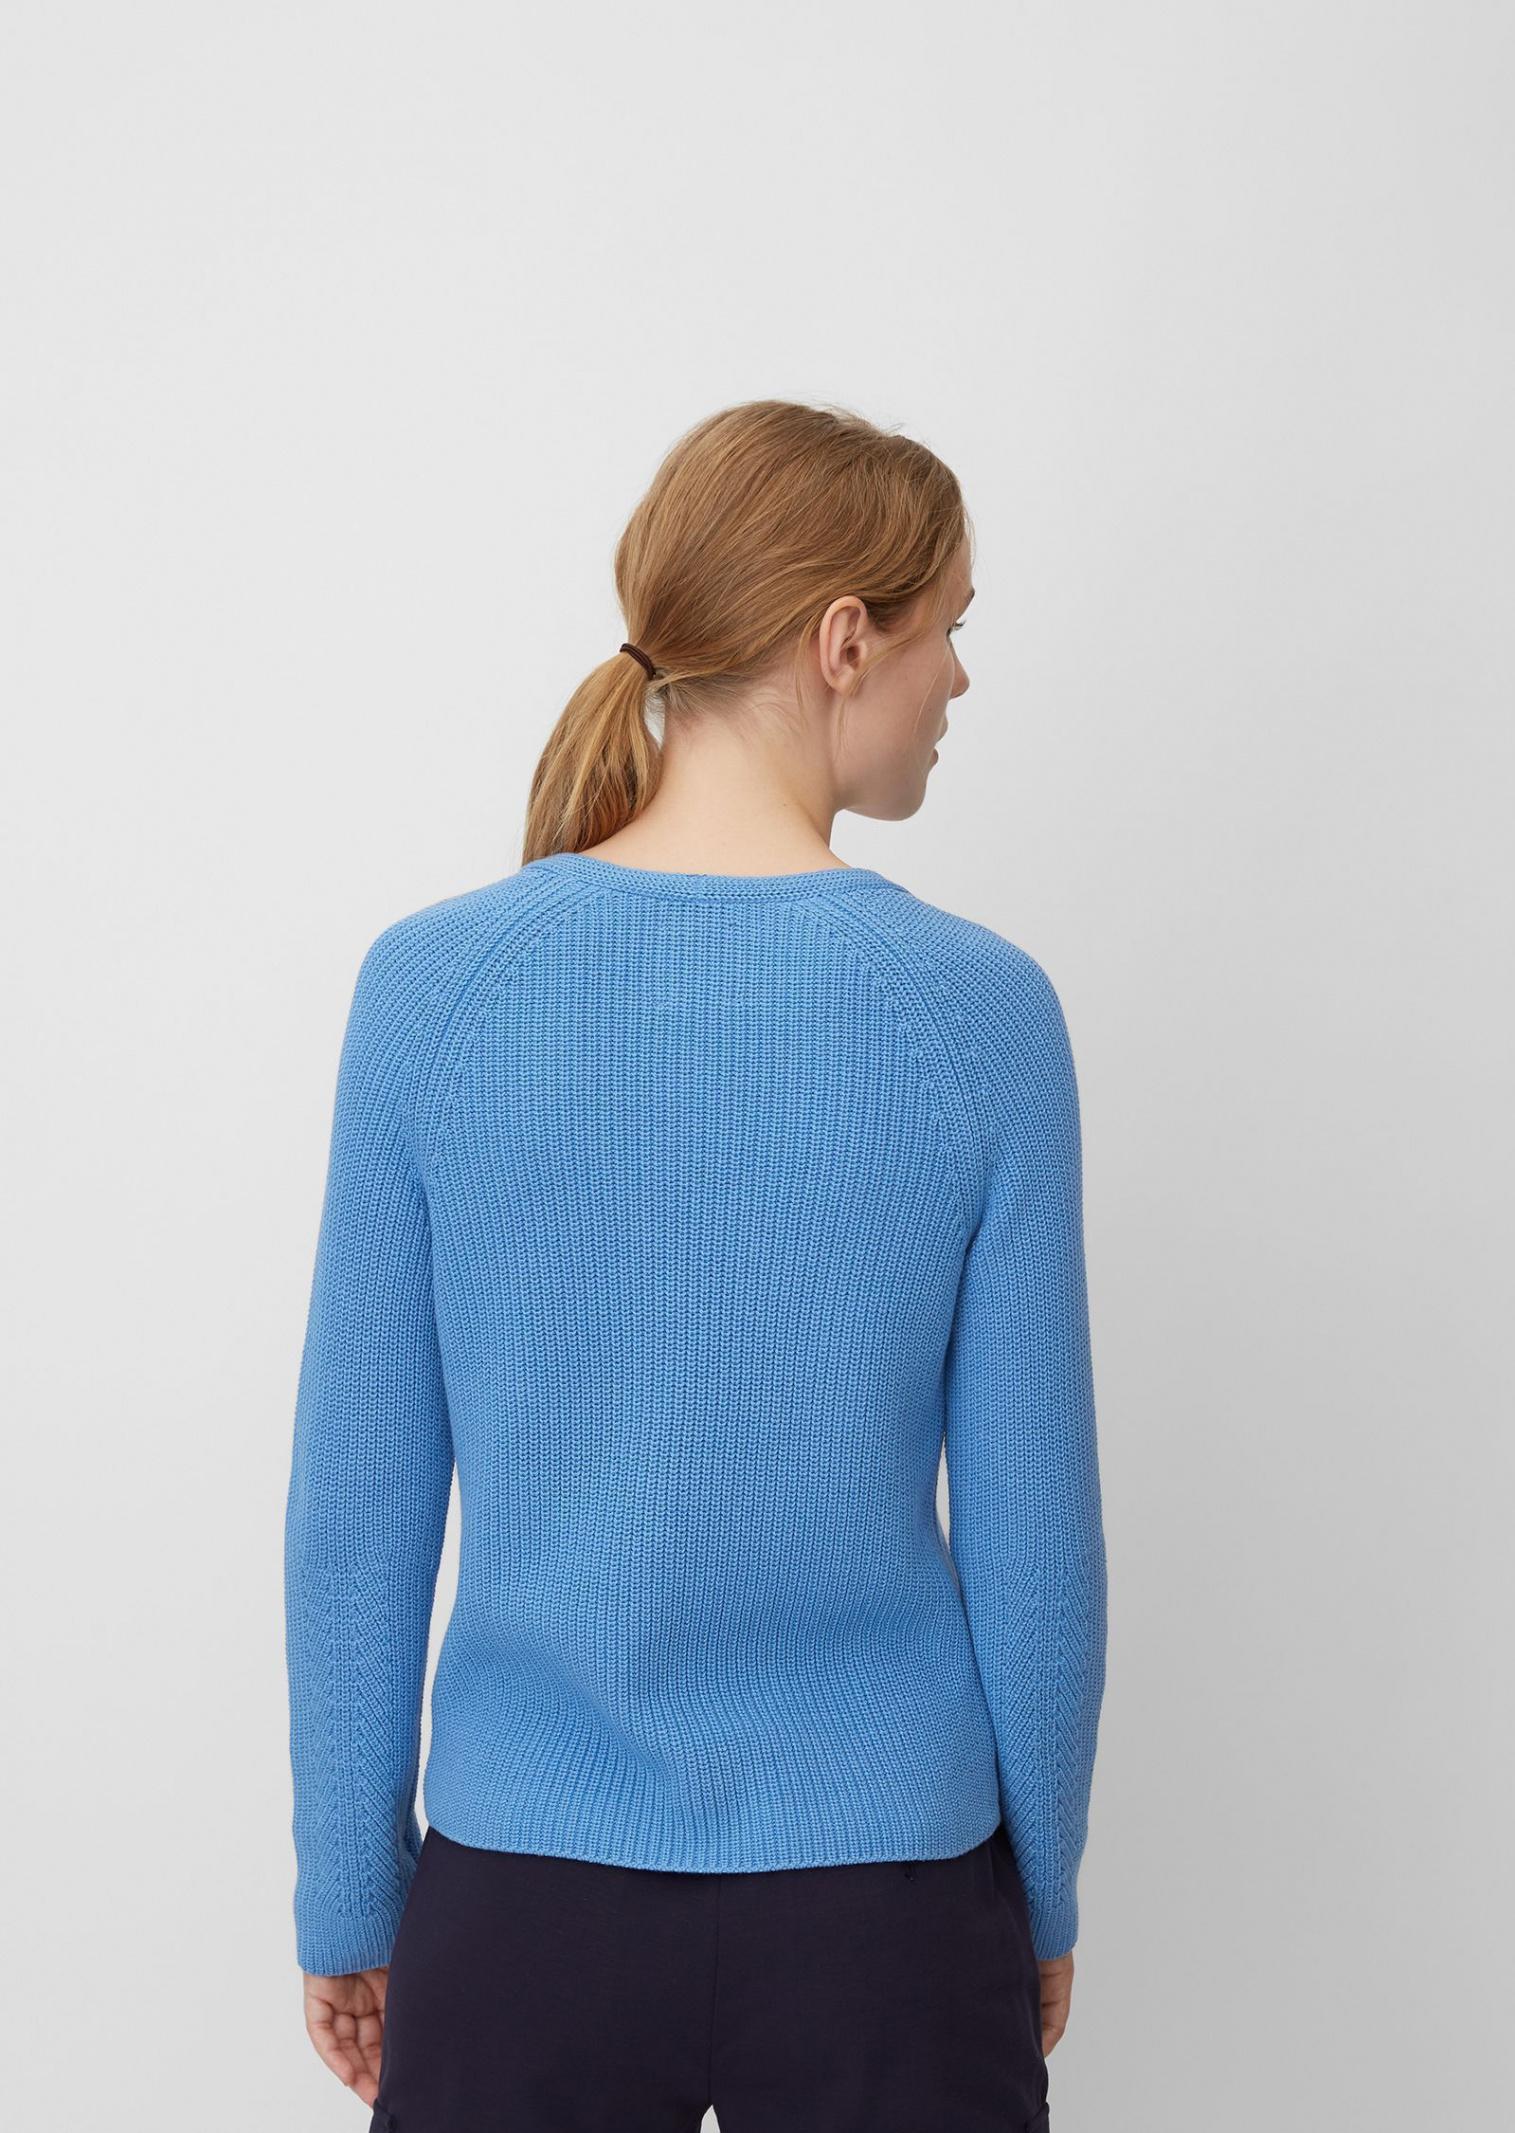 Кофты и свитера женские MARC O'POLO модель PF3981 , 2017